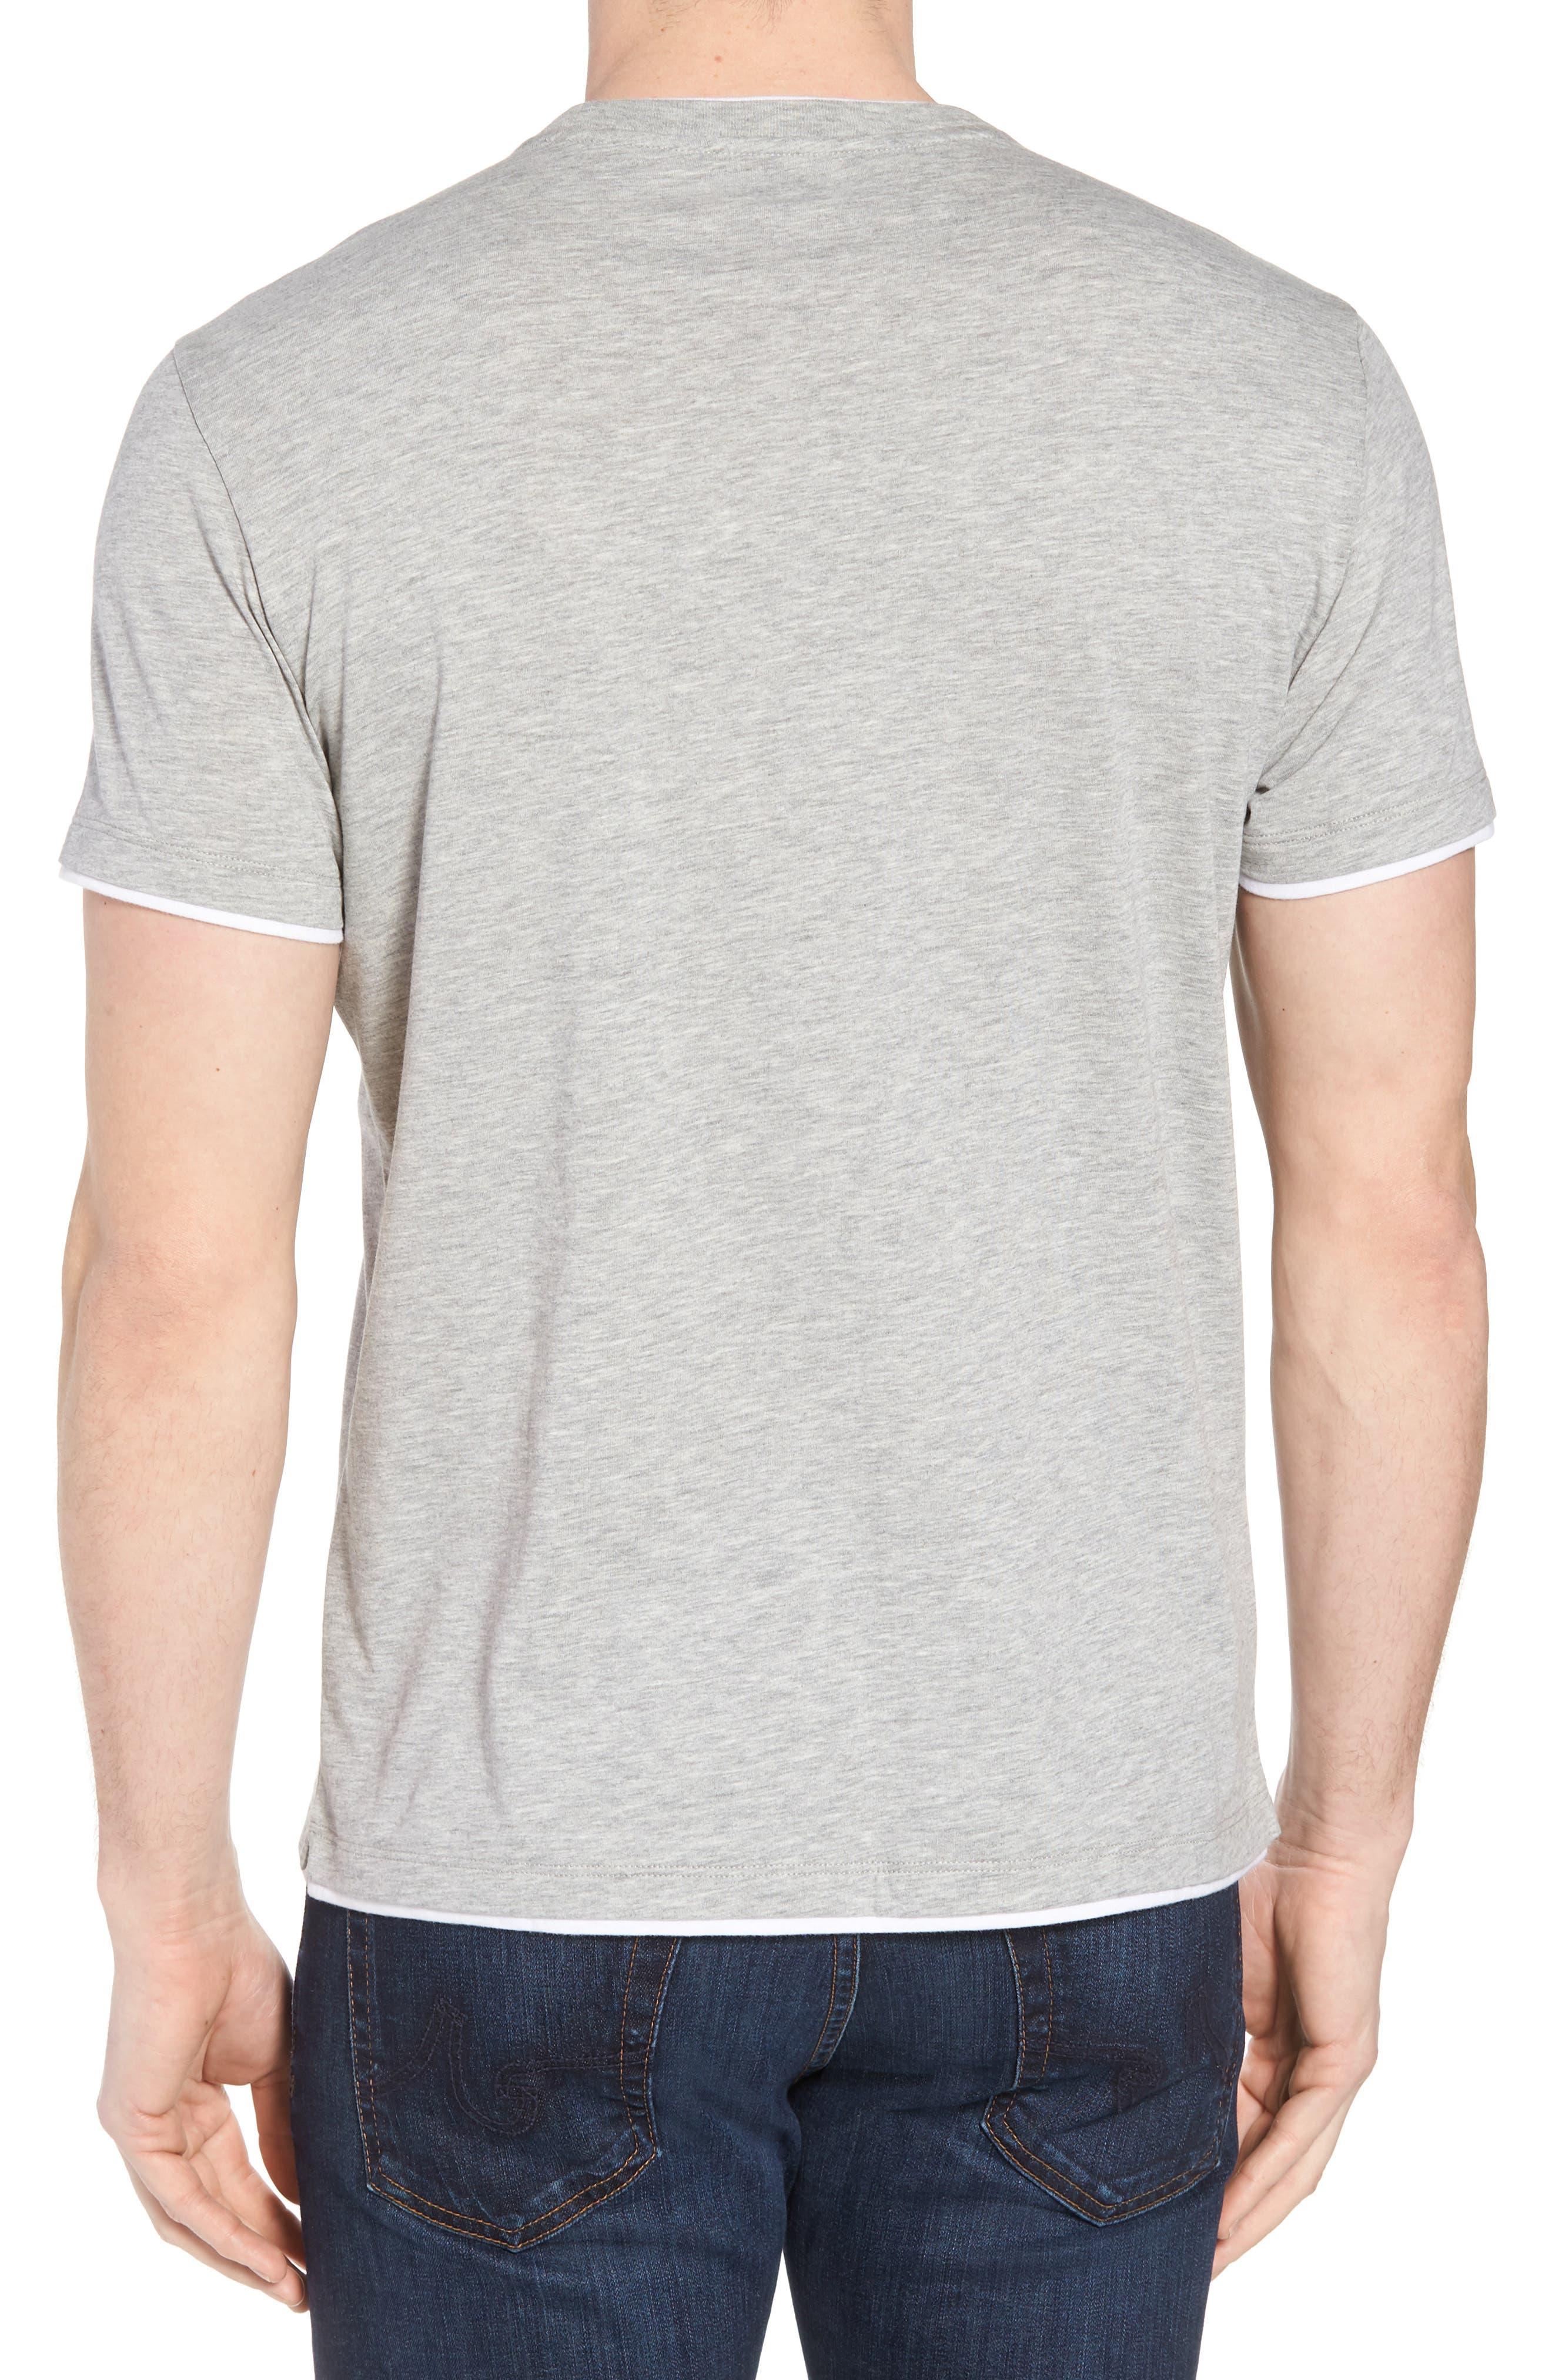 Halifax Crewneck T-Shirt,                             Alternate thumbnail 2, color,                             Light Grey